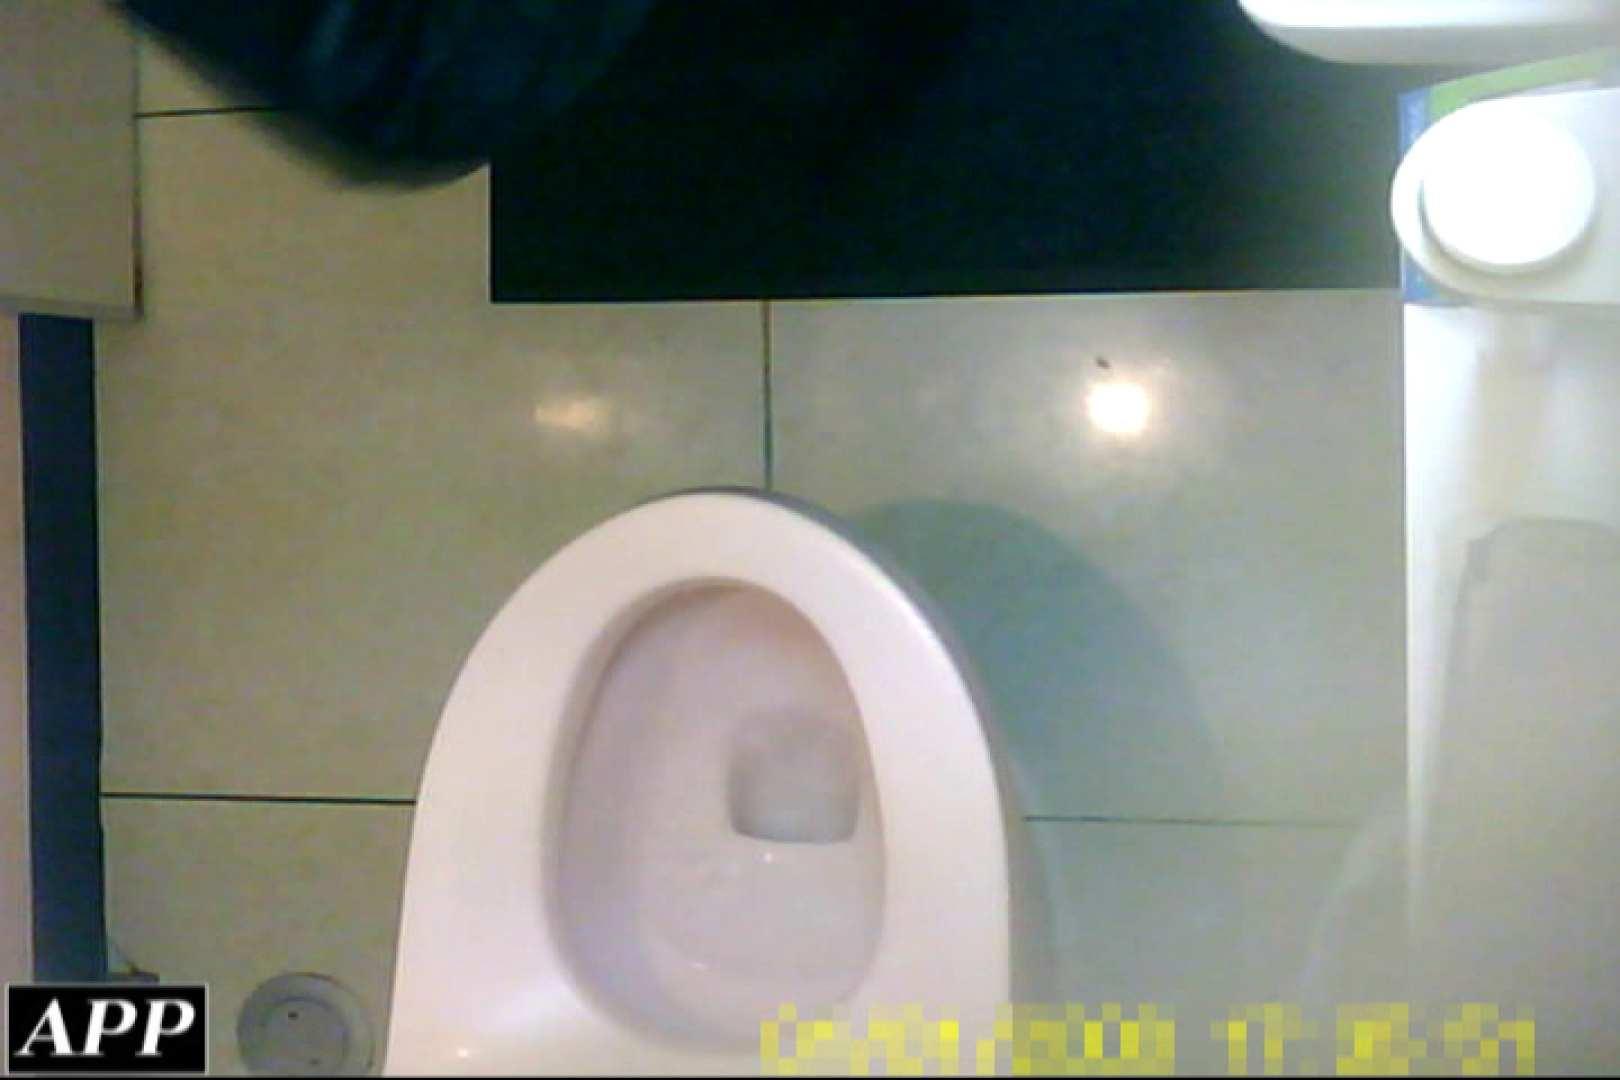 3視点洗面所 vol.19 OLのボディ 盗撮動画紹介 96PIX 26